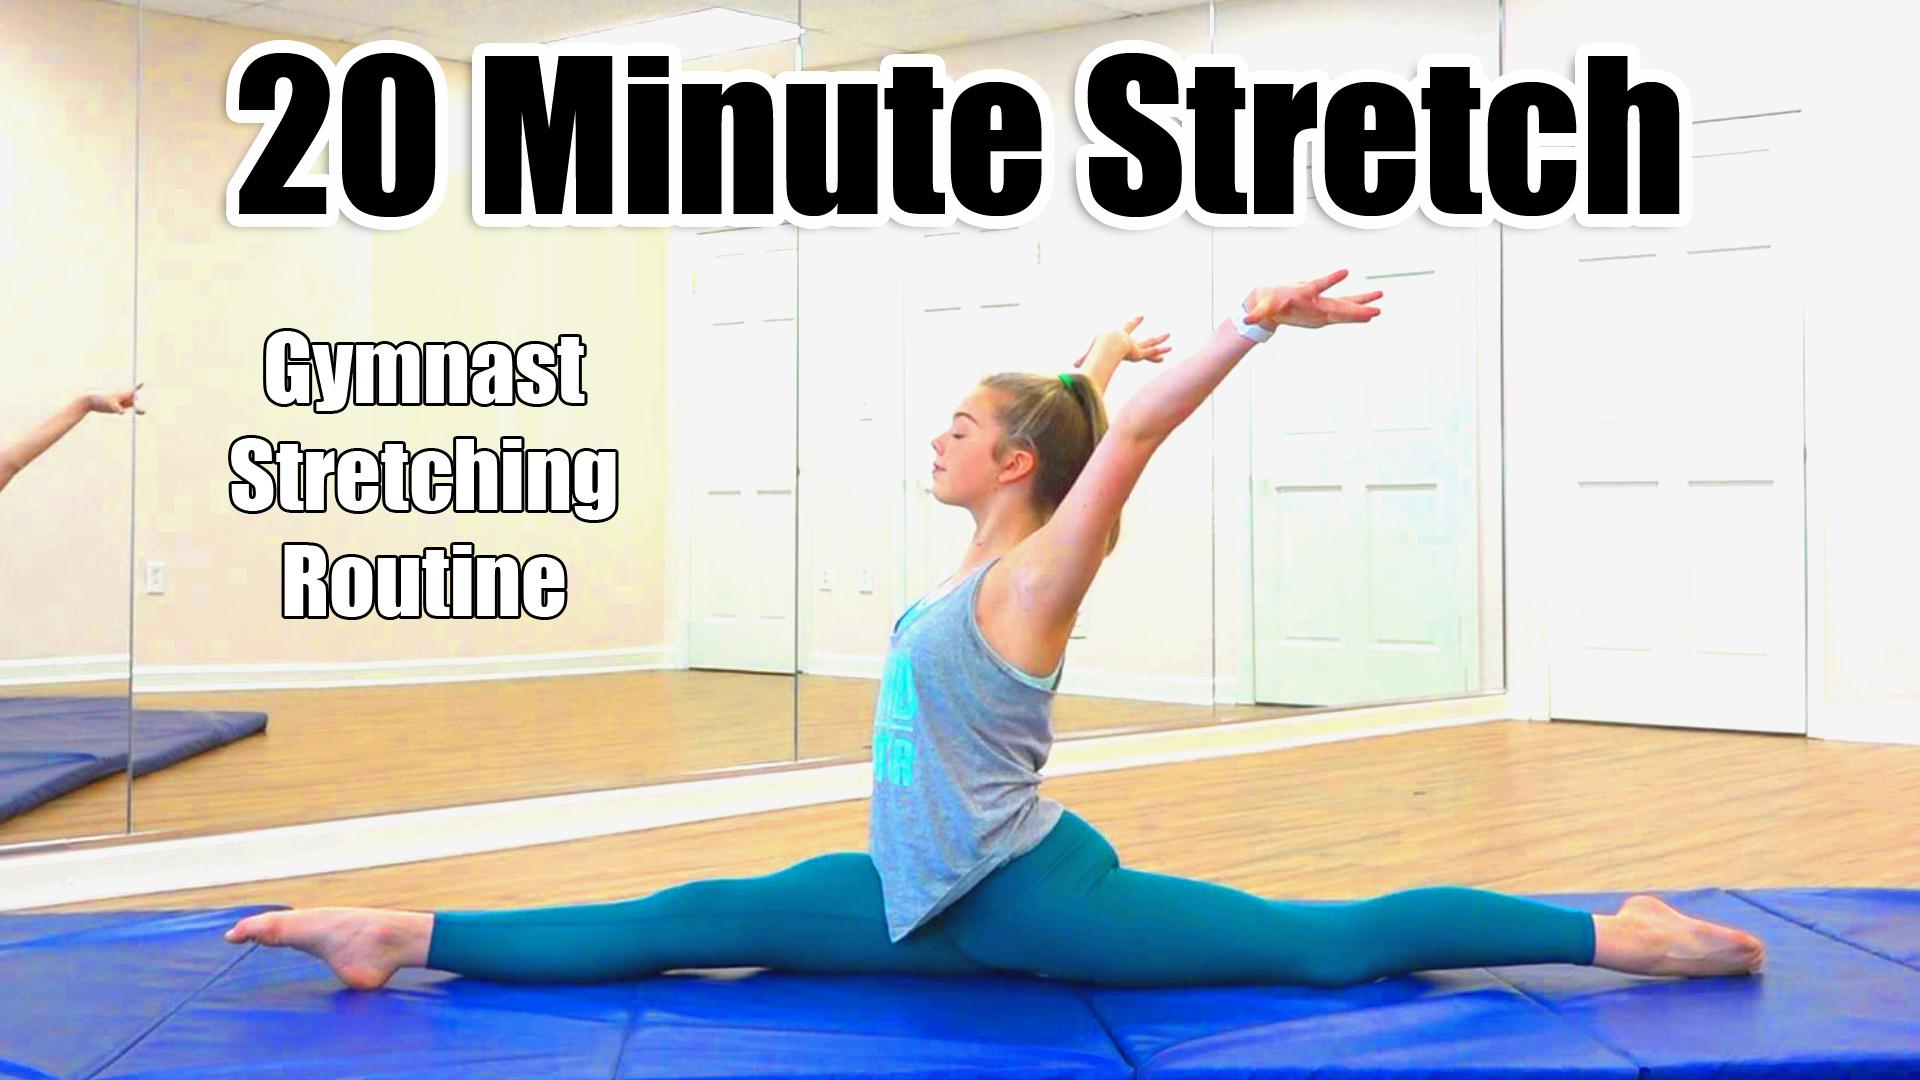 20 Minute Stretch - Gymnast Stretching Routine